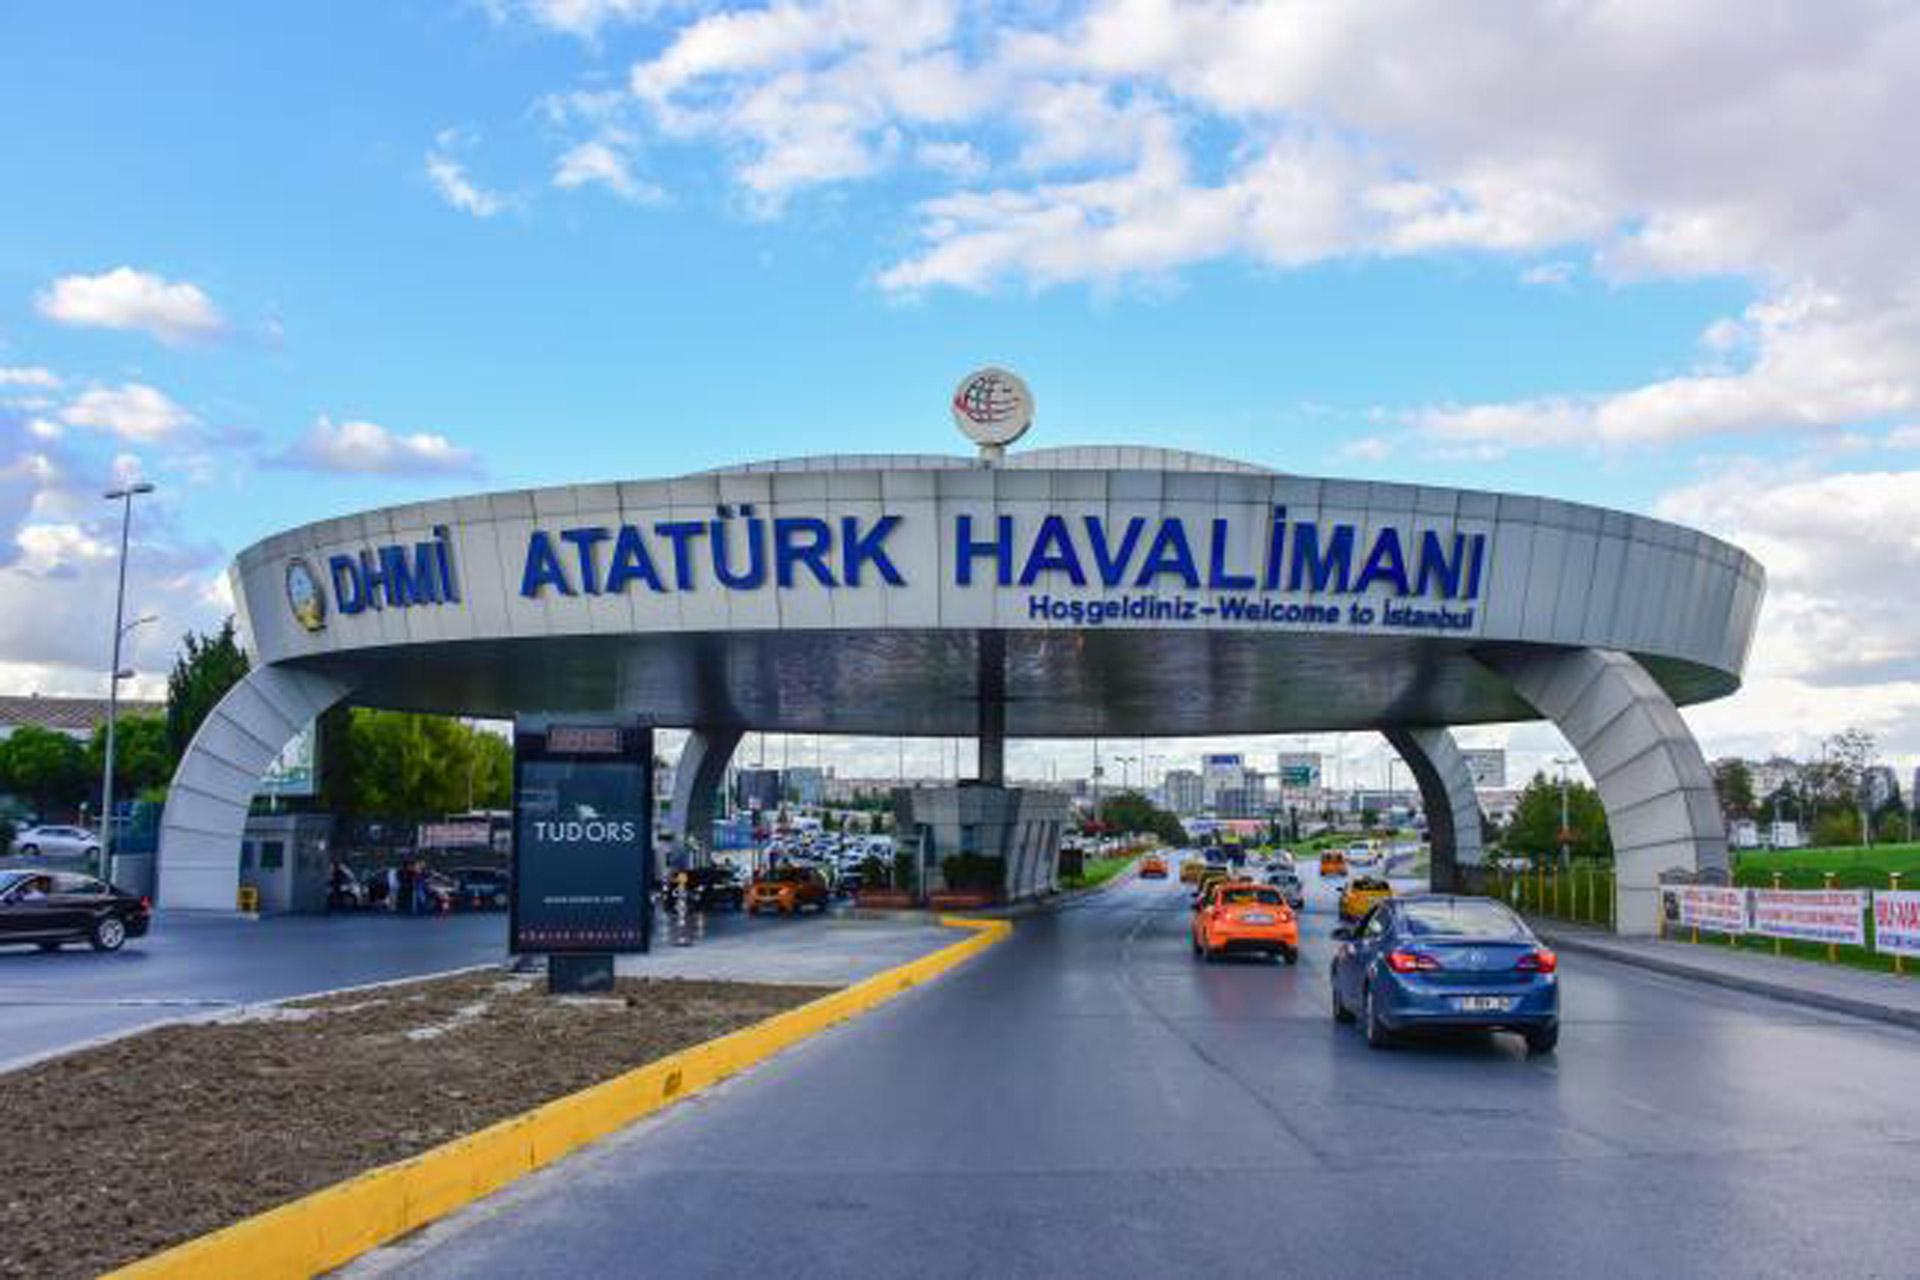 aeropuerto estambul turquia sabiha gokcen y ataturk airport